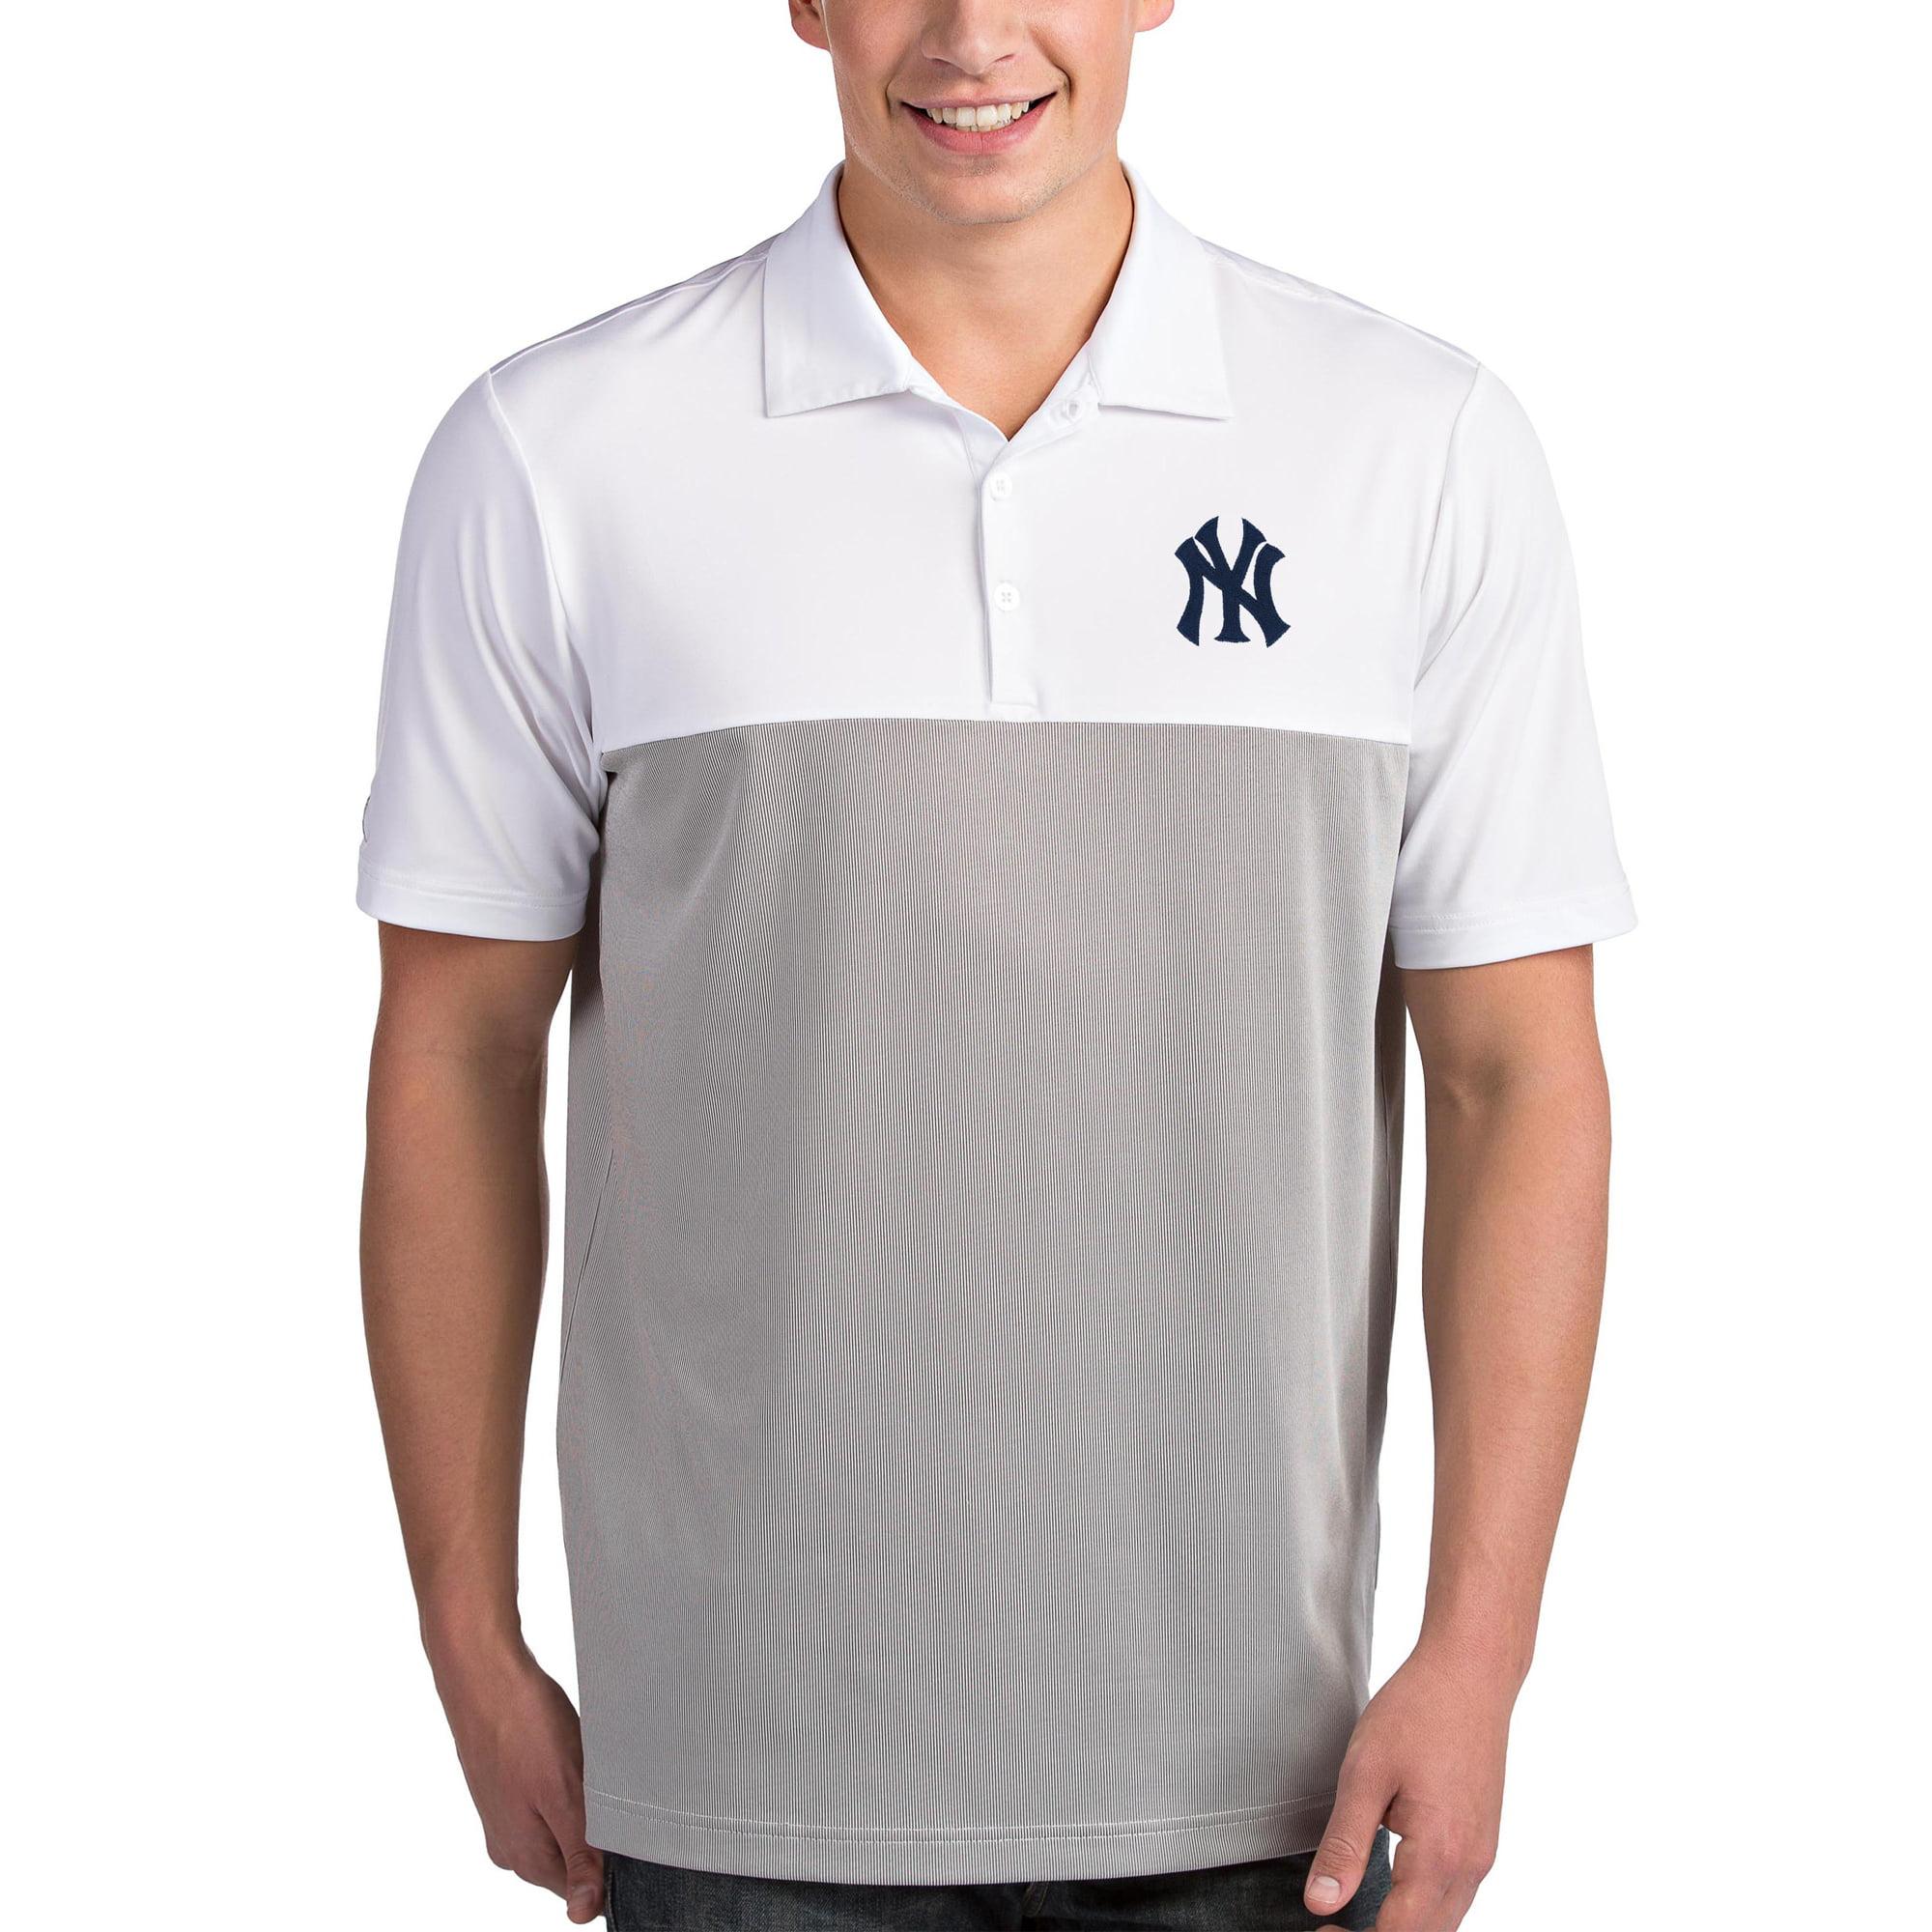 New York Yankees Antigua Venture Polo - White/Gray